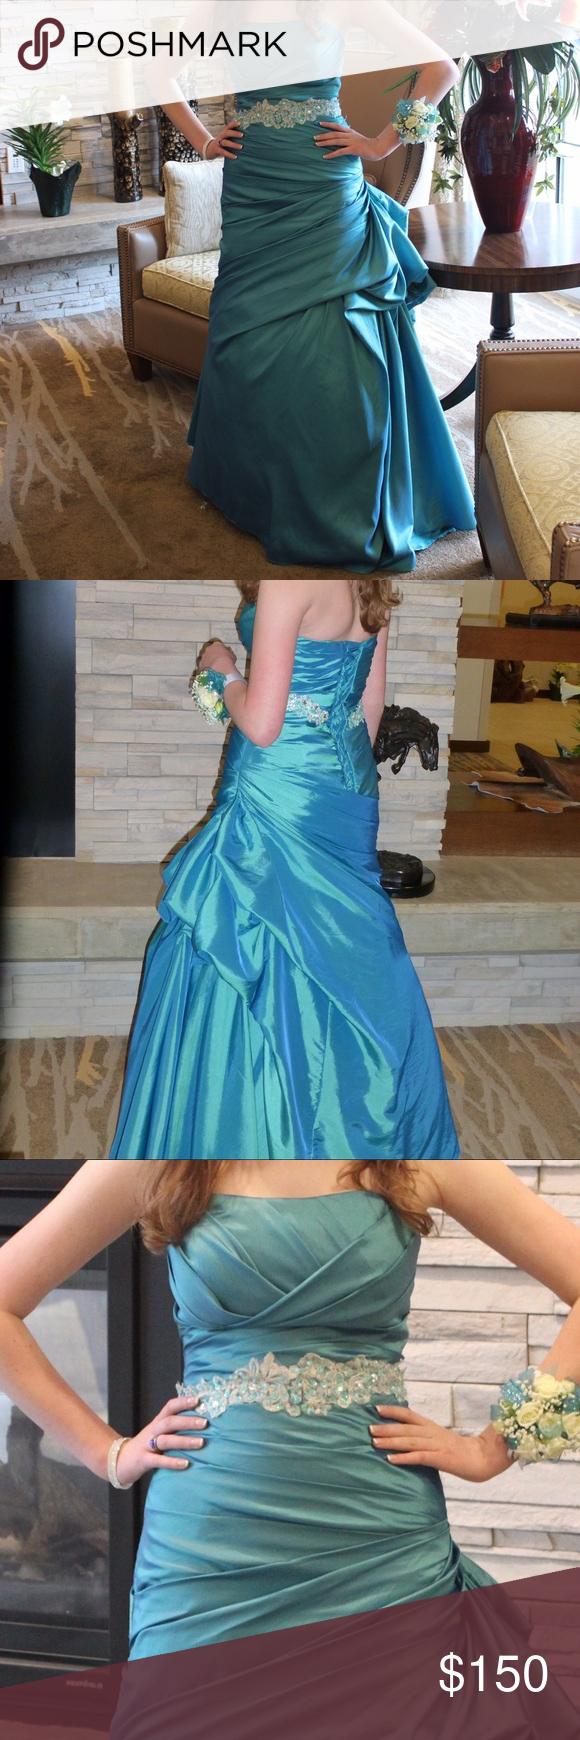 Selling this Teal mermaid prom dress on Poshmark! My username is: alannskywalker. #shopmycloset #poshmark #fashion #shopping #style #forsale #prom #Dresses & Skirts